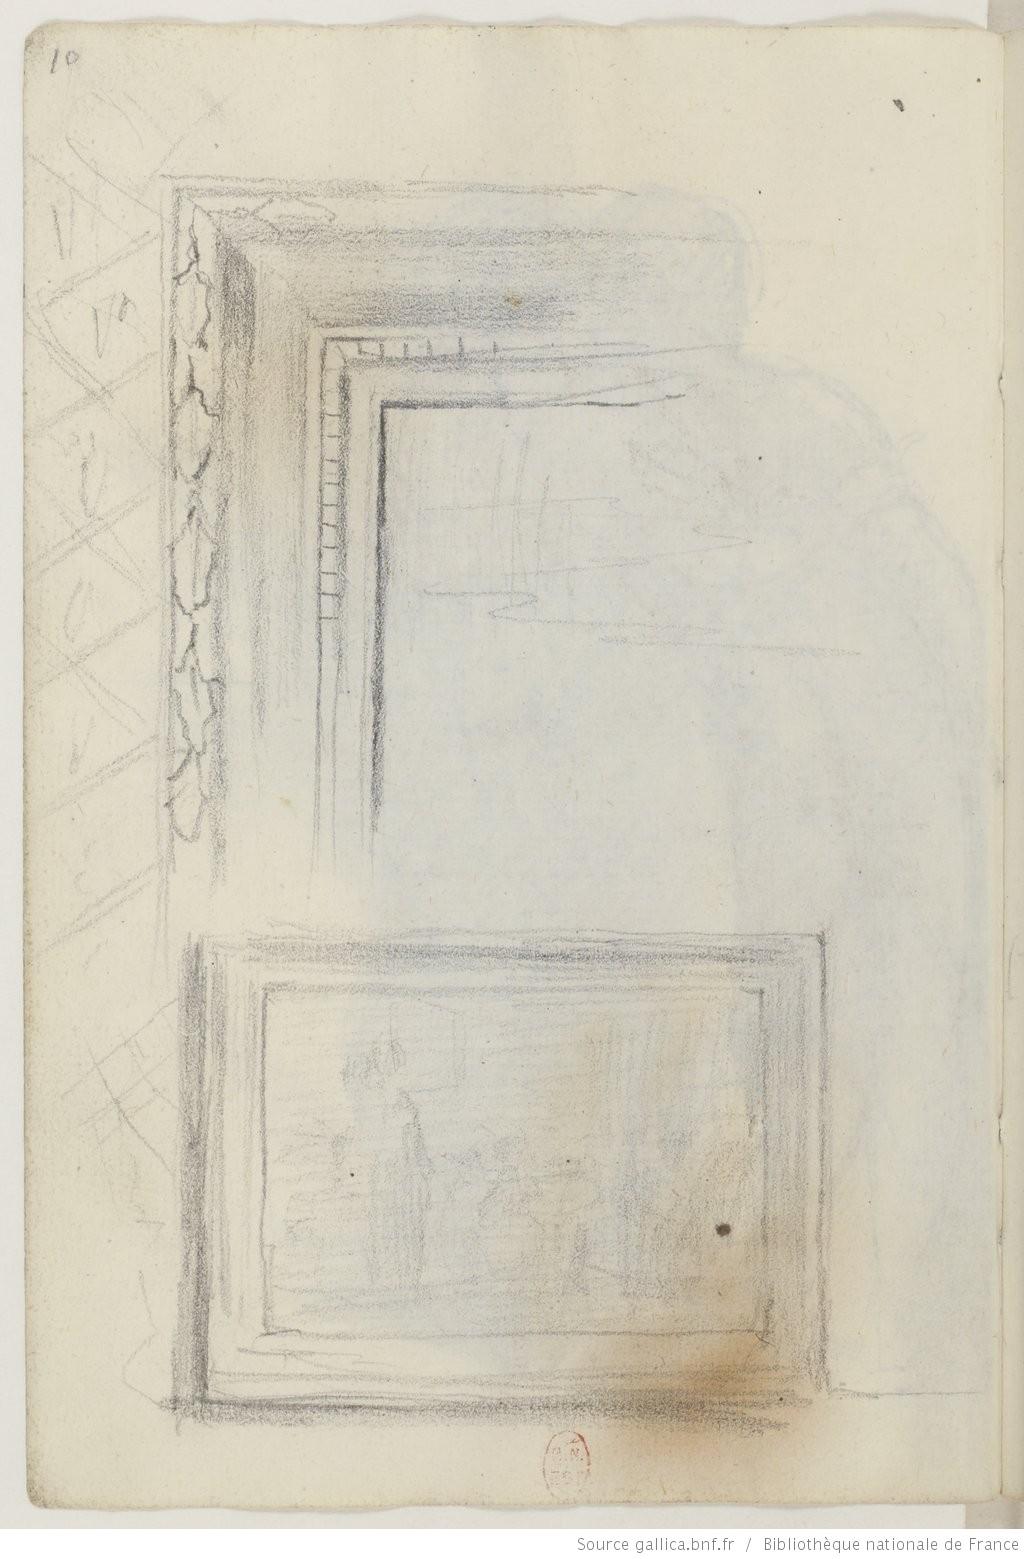 Рис.1 Эдгар Дега,Записная книжка 16, стр.10, 1858-60.